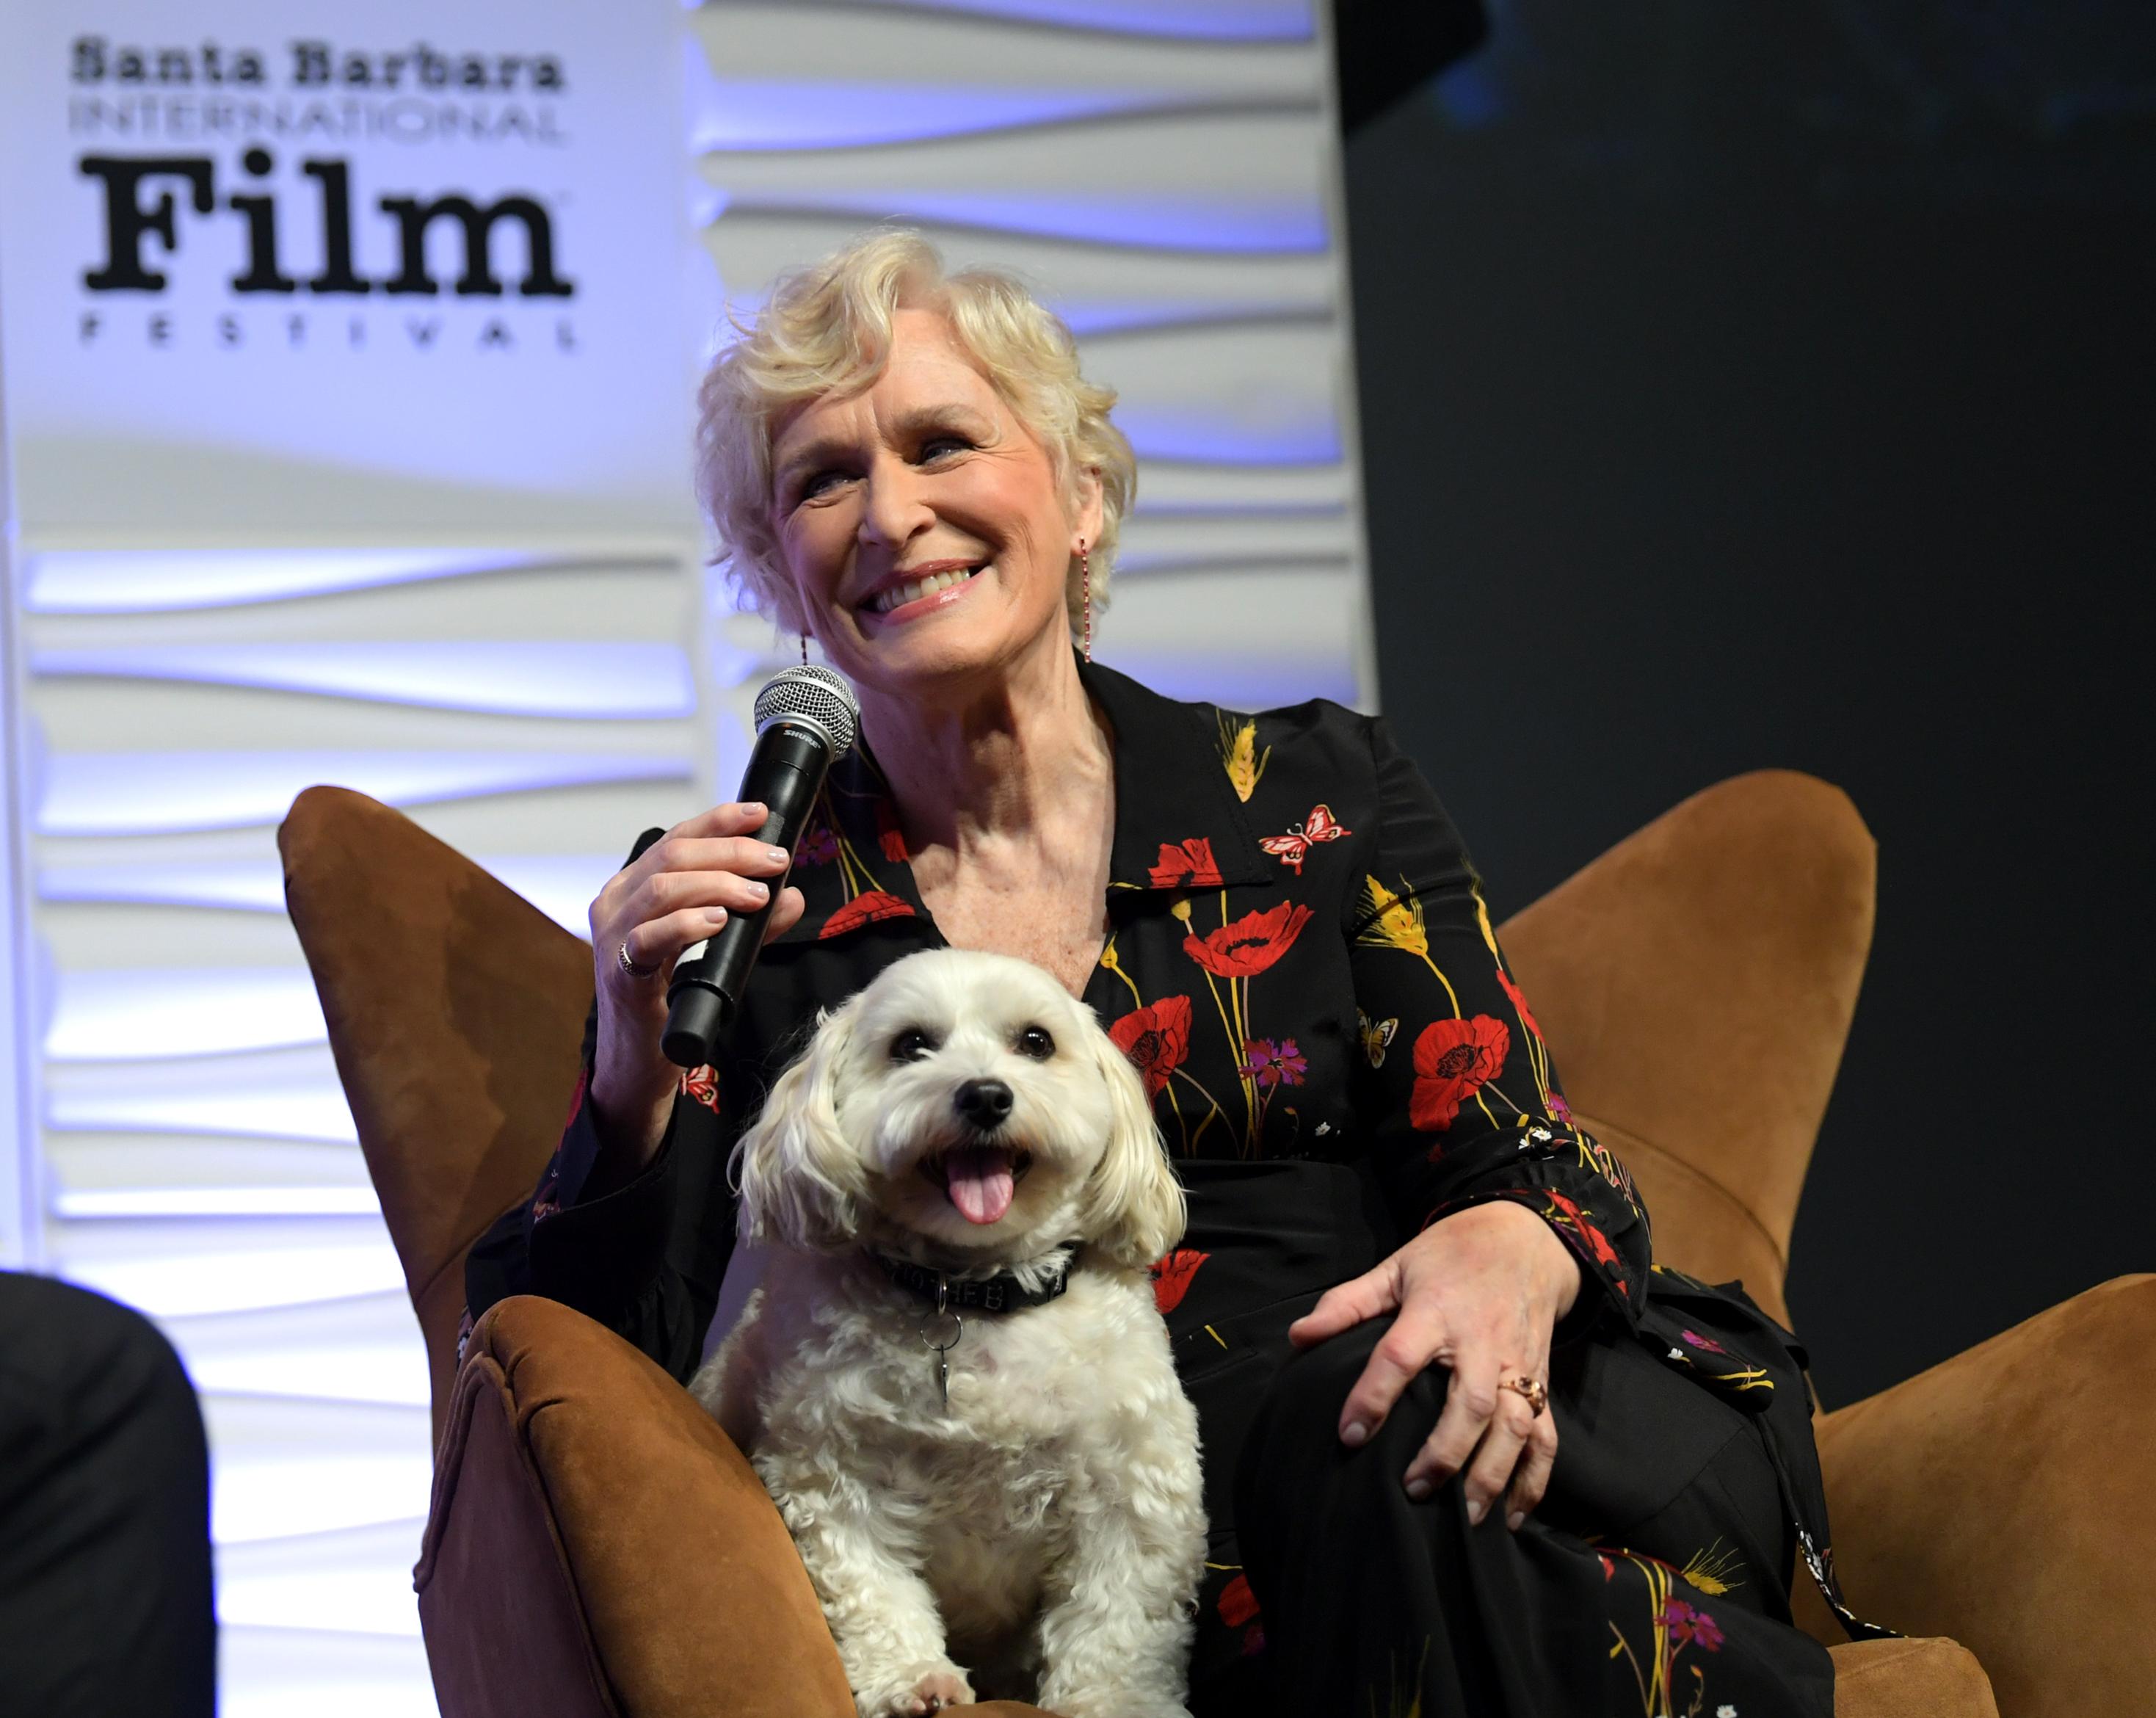 34th Santa Barbara International Film Festival - Maltin Modern Master Award Honoring Glenn Close